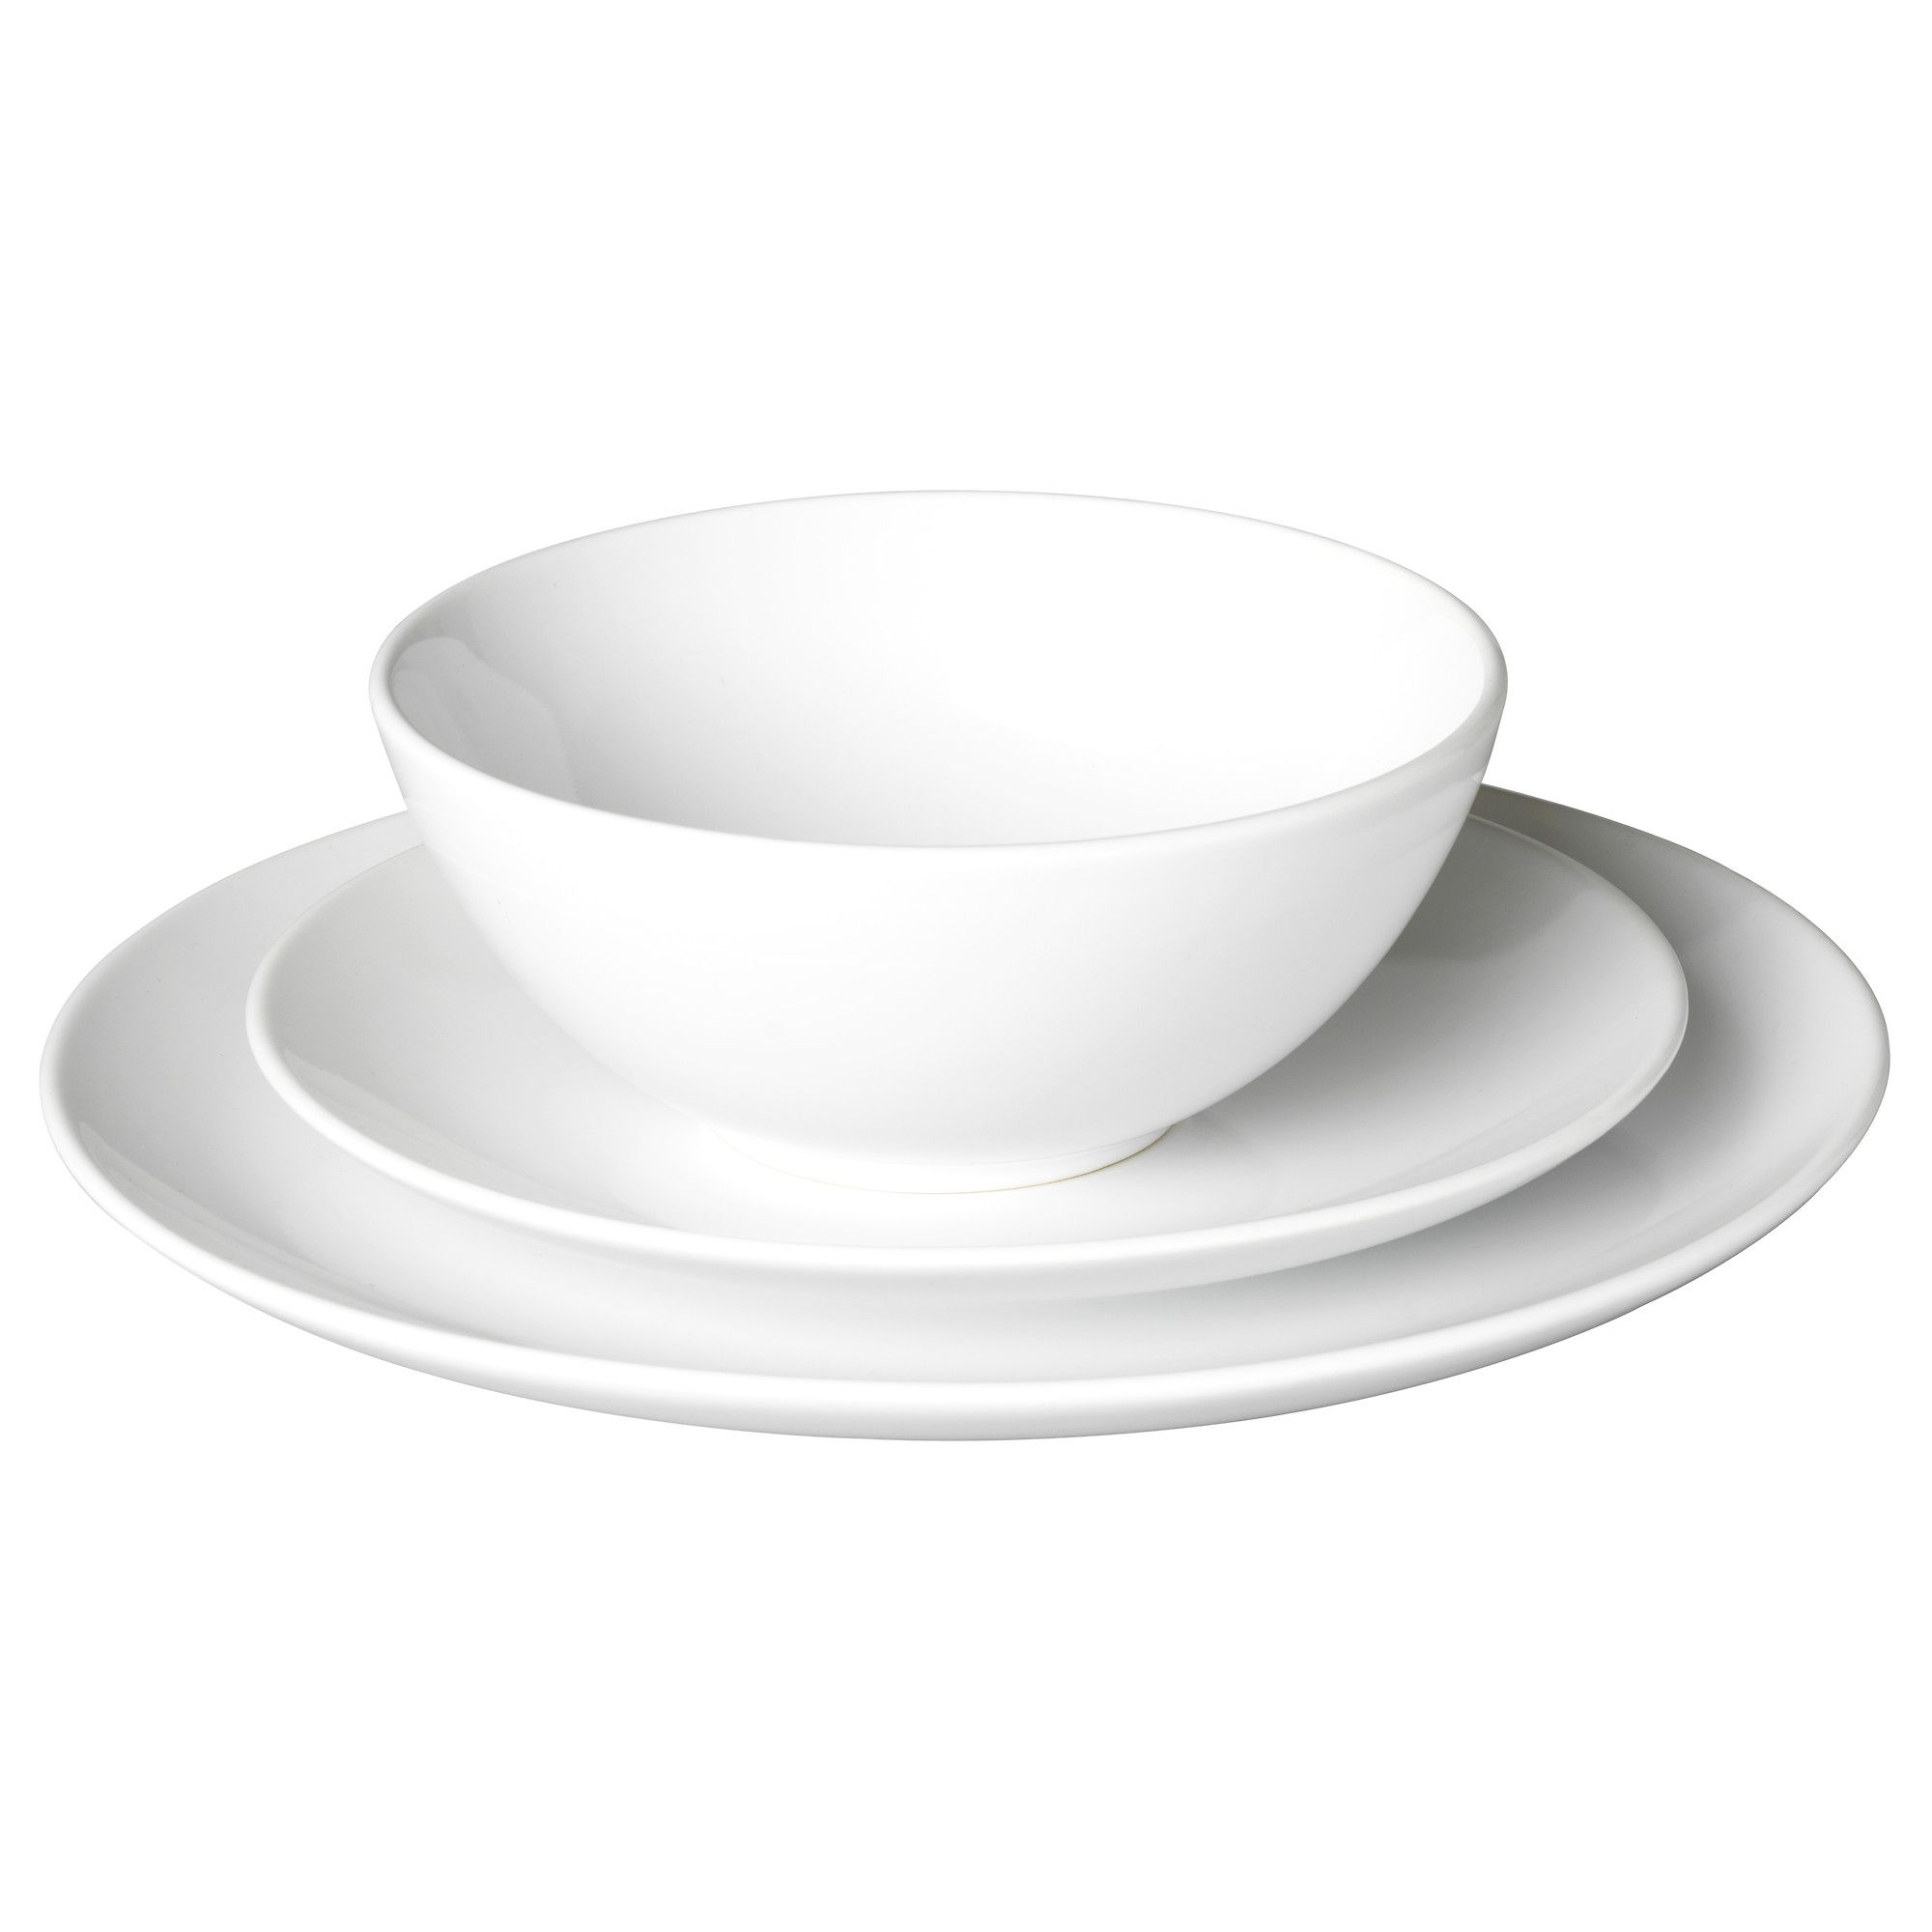 Good FÄRGRIK 18 Piece Dinnerware Set   White/stoneware   IKEA $19.99 (service For